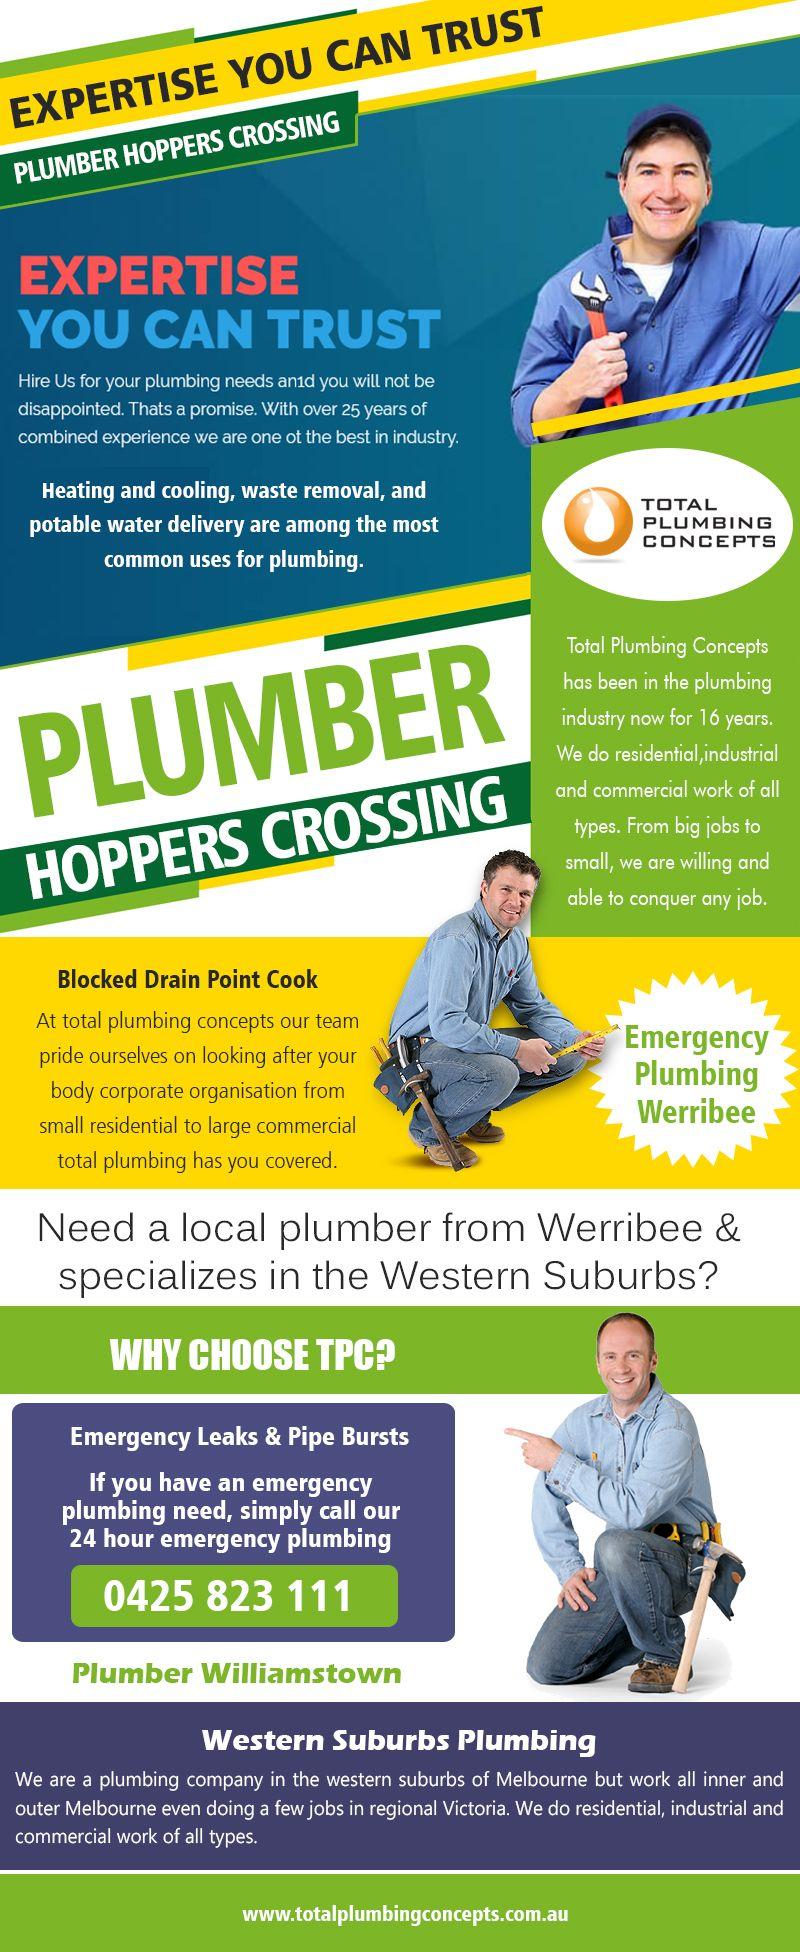 Areas We Services Plumber Plumbing Emergency Plumbing